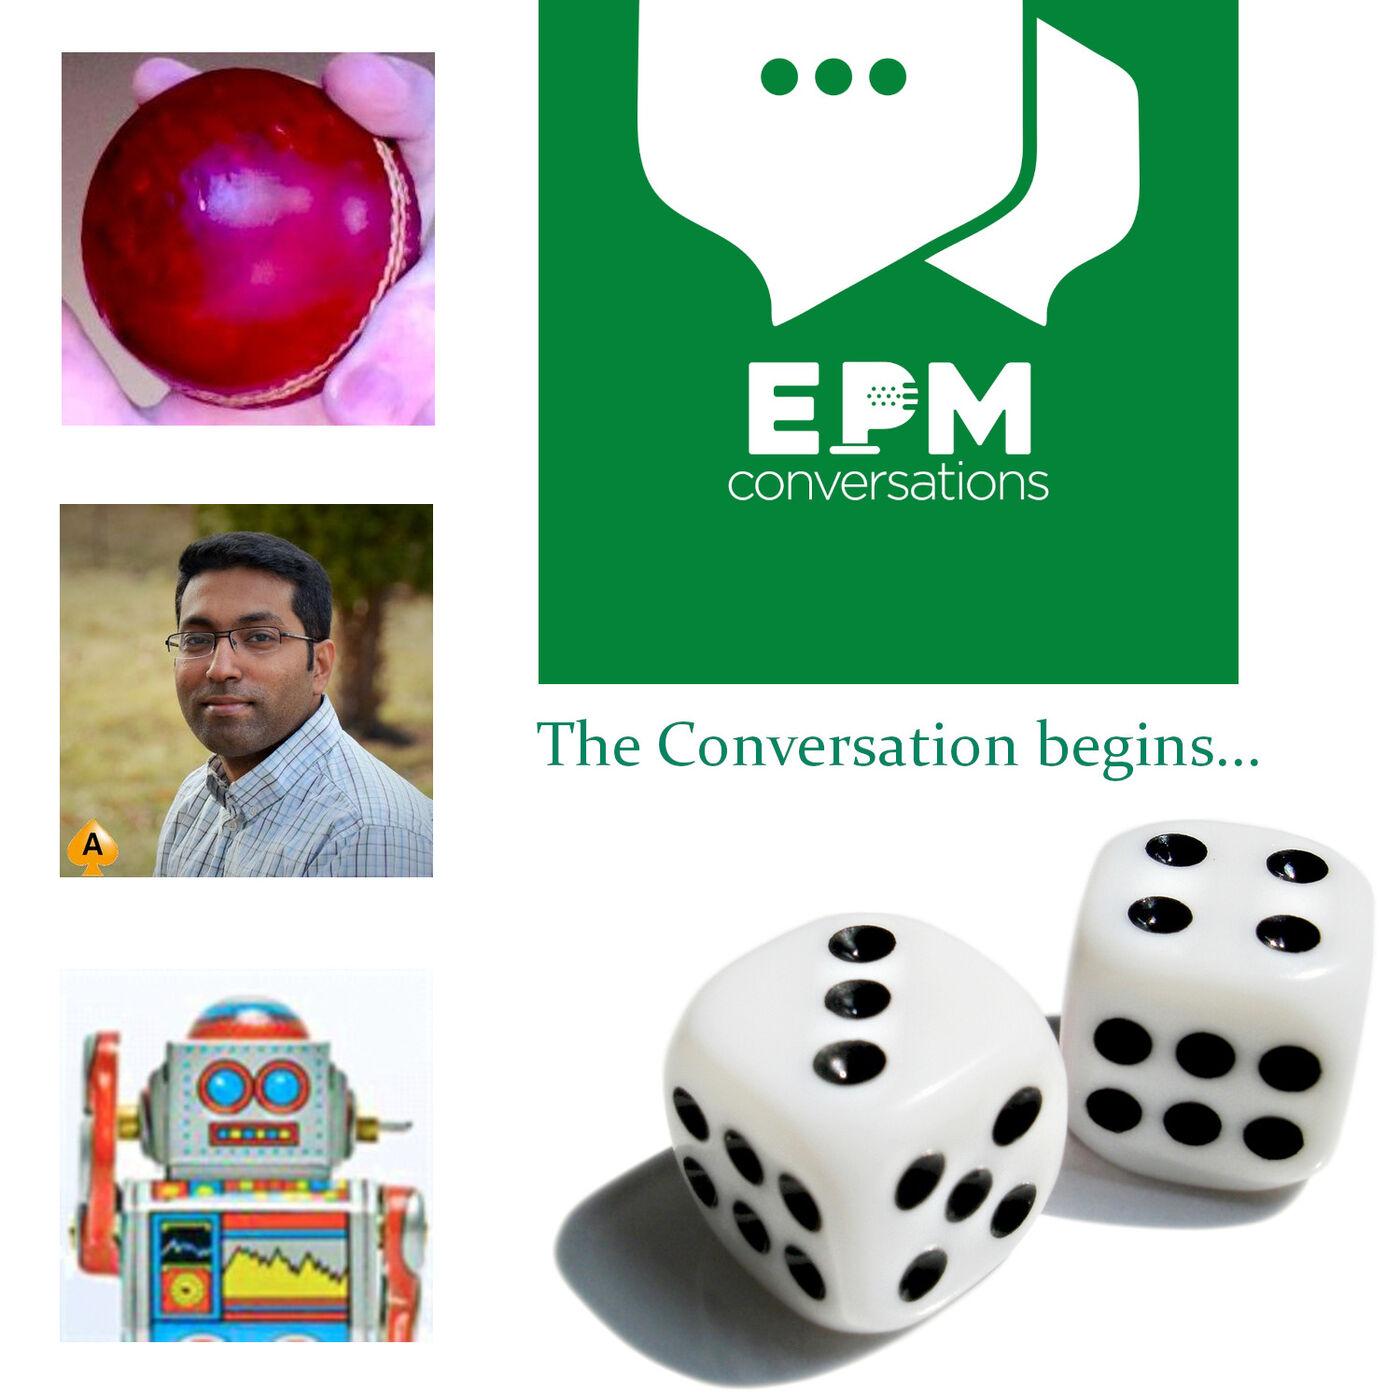 EPM Conversations — Episode No. 1, Introduction with Tim German, Celvin Kattookaran, and Cameron Lackpour